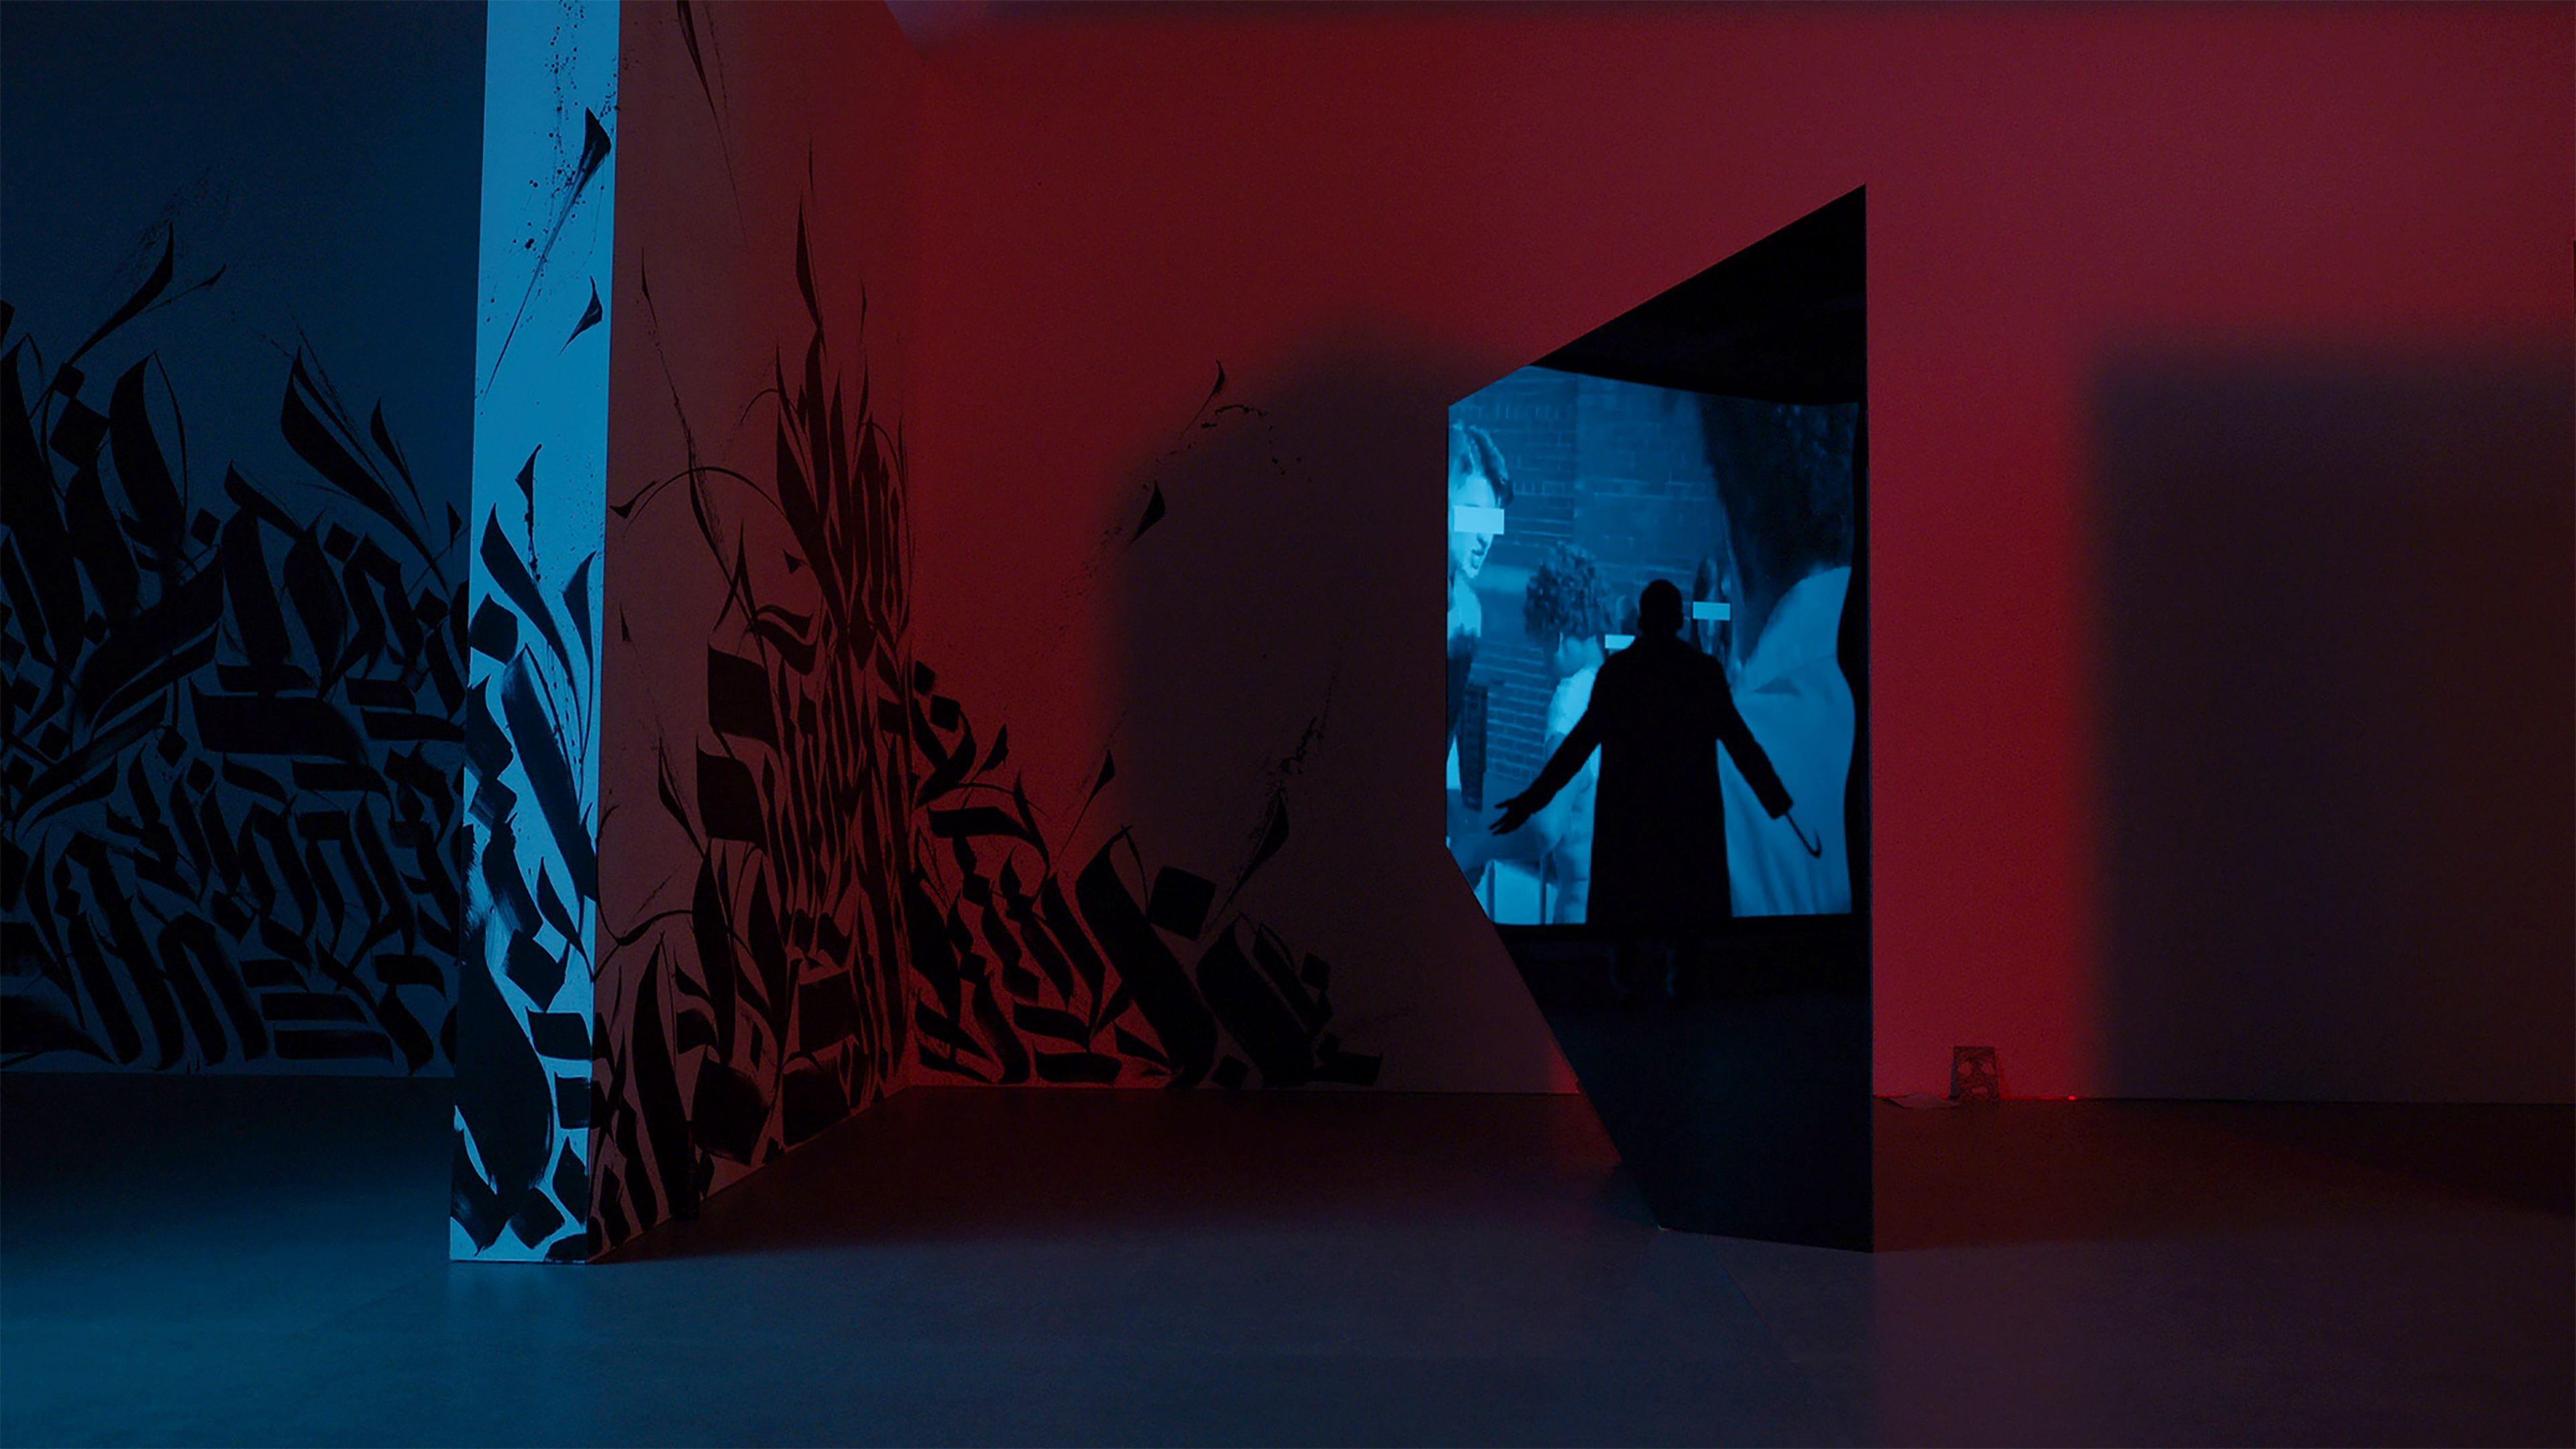 Candyman 2021 silhouette art museum